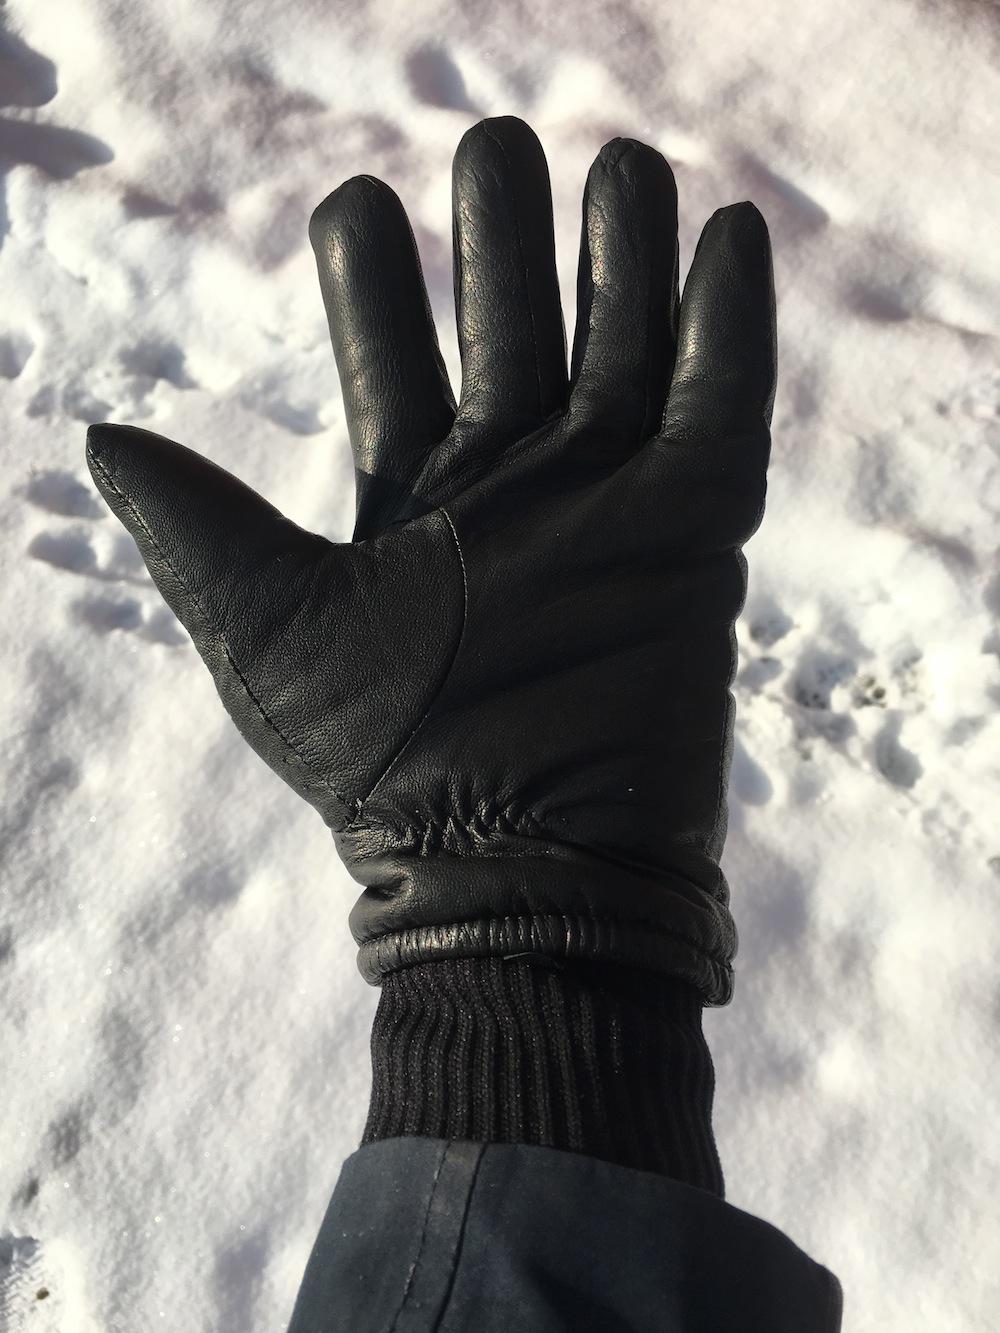 Glove palm and knit storm cuff.